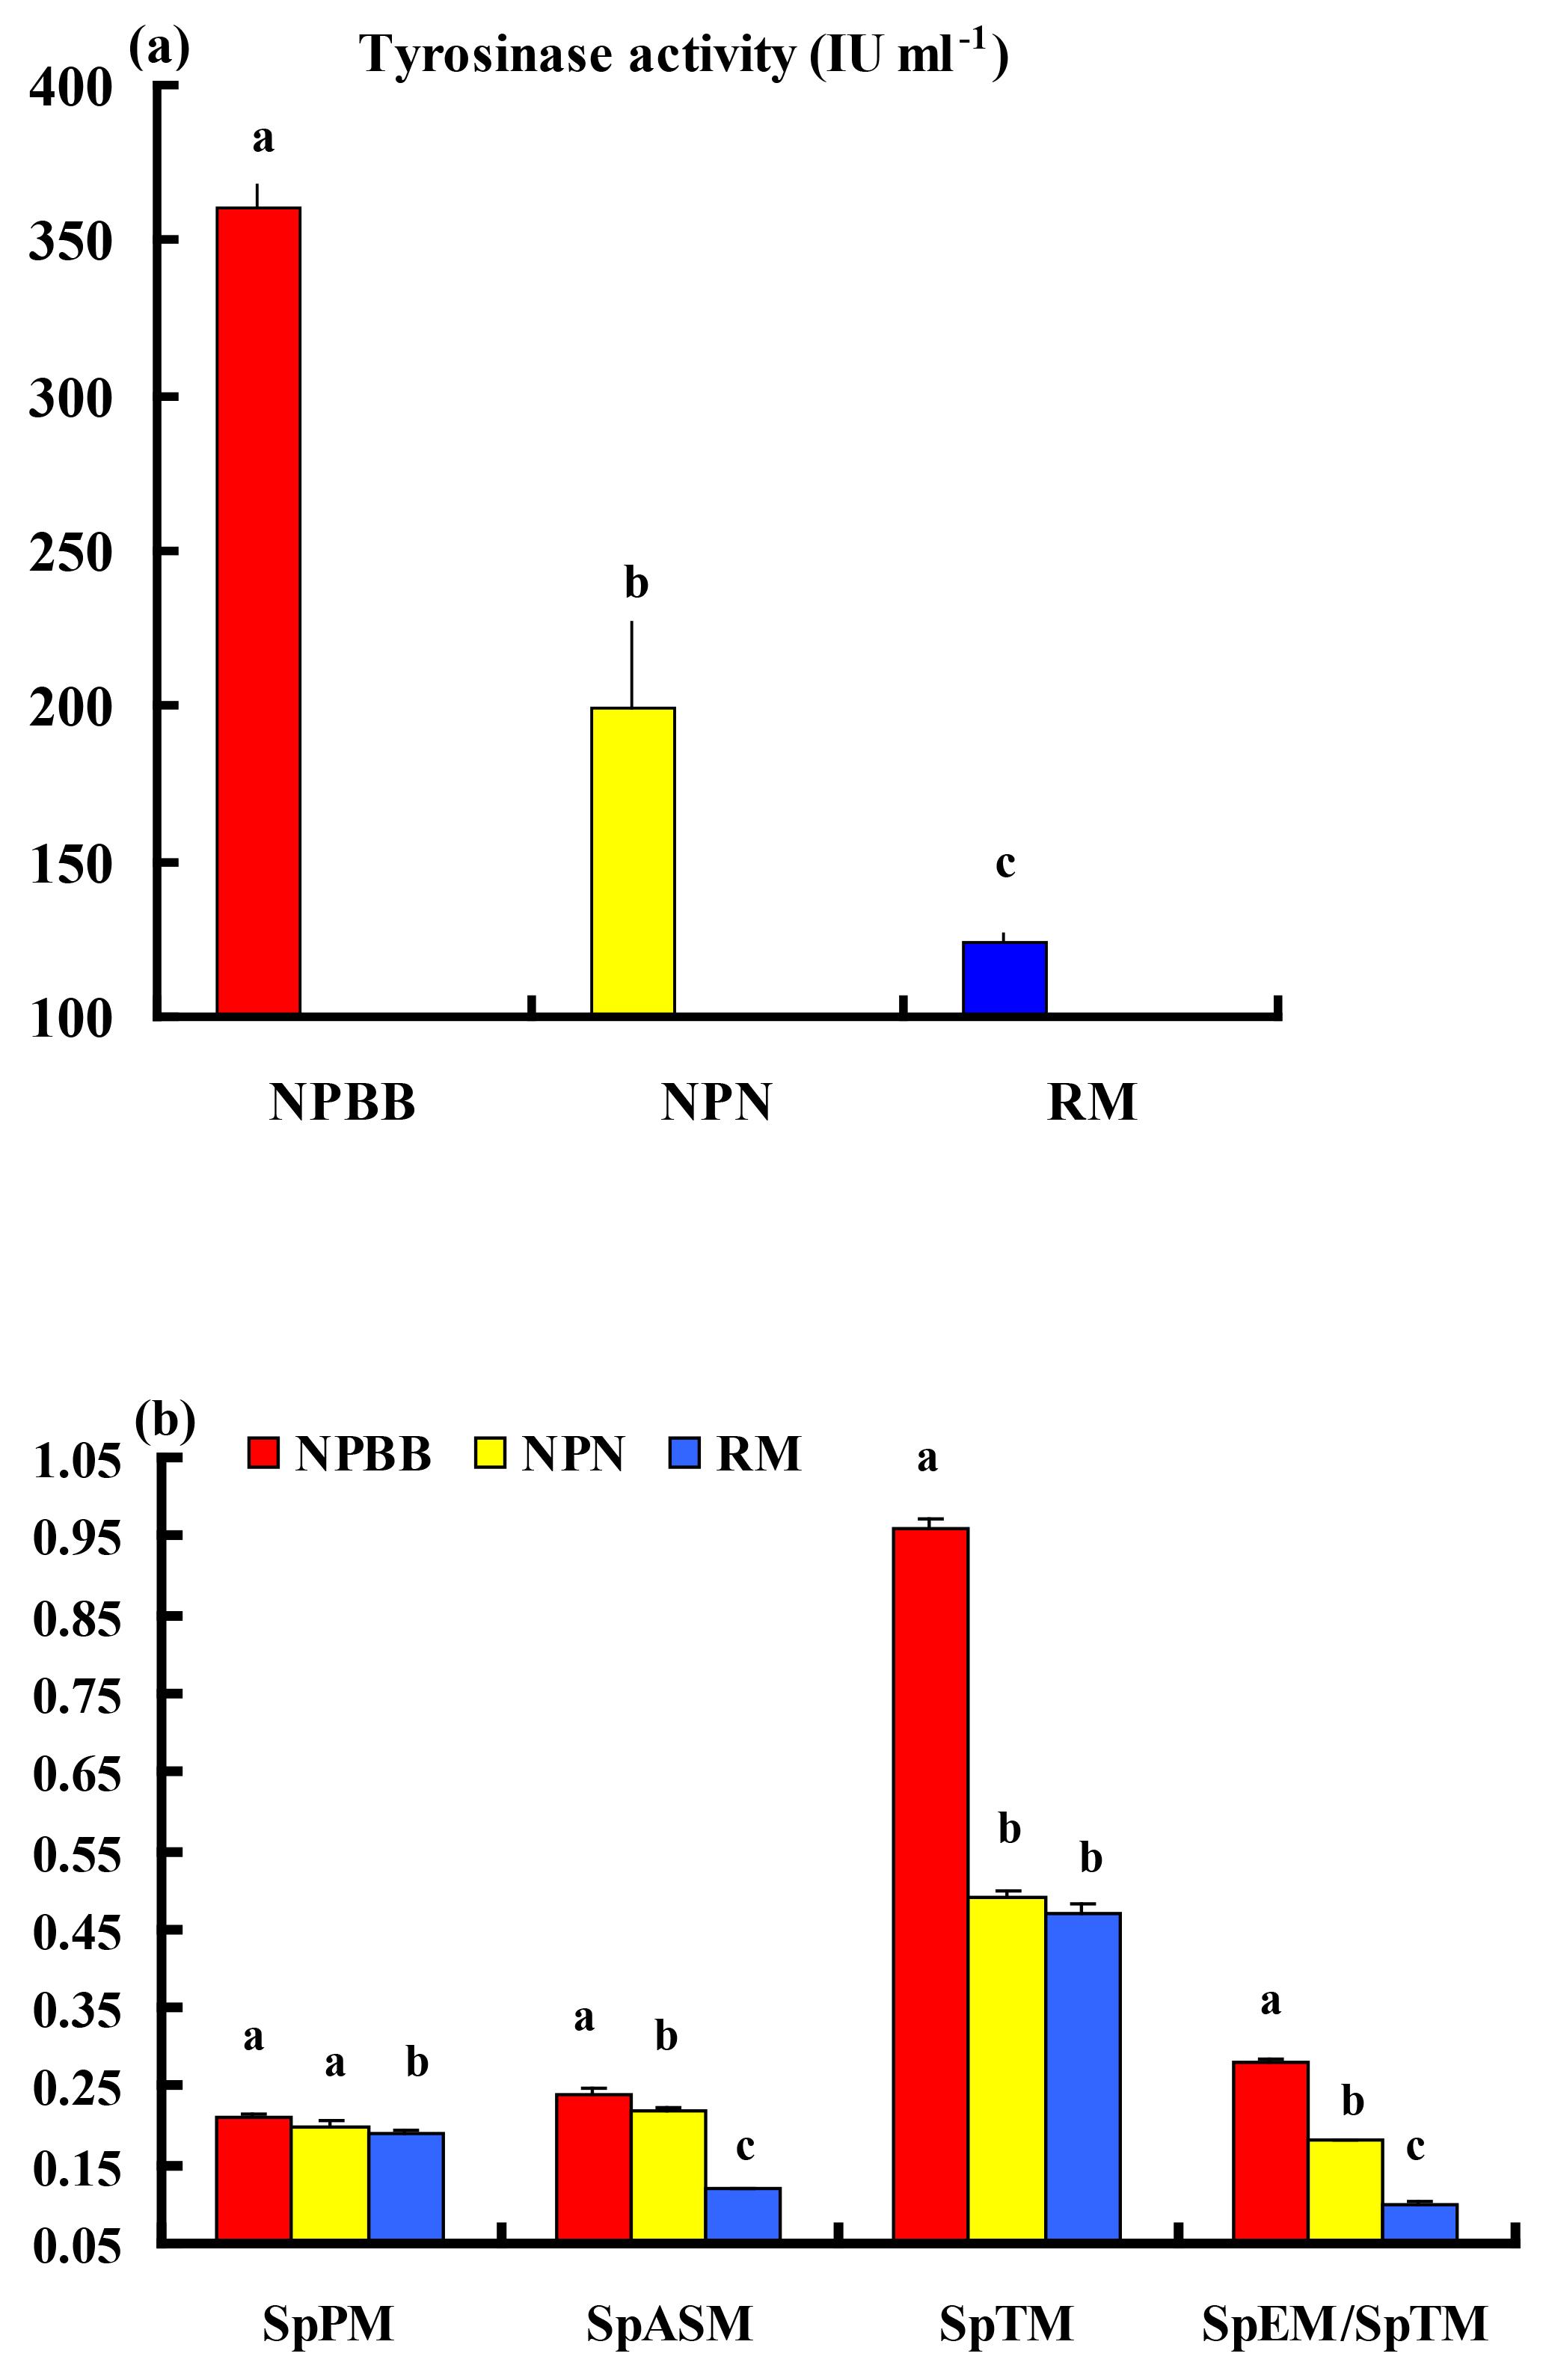 AAB - An examination of melanogenic traits and TYRP1